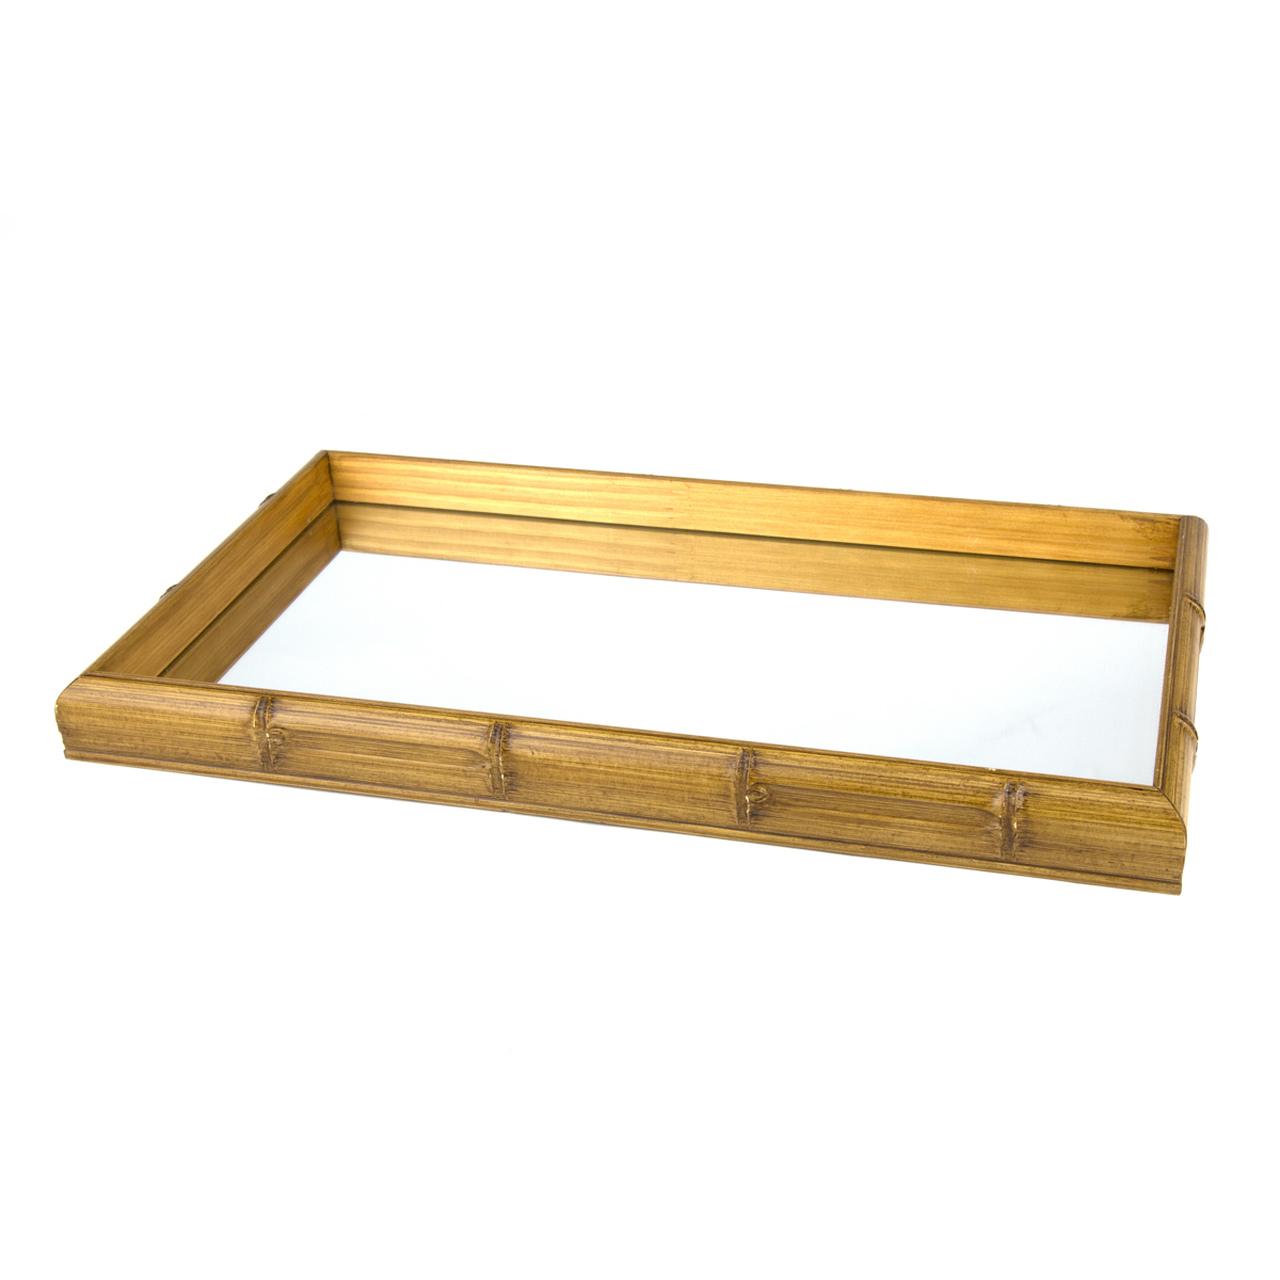 Bandeja bambu c/ espelho 46 cm